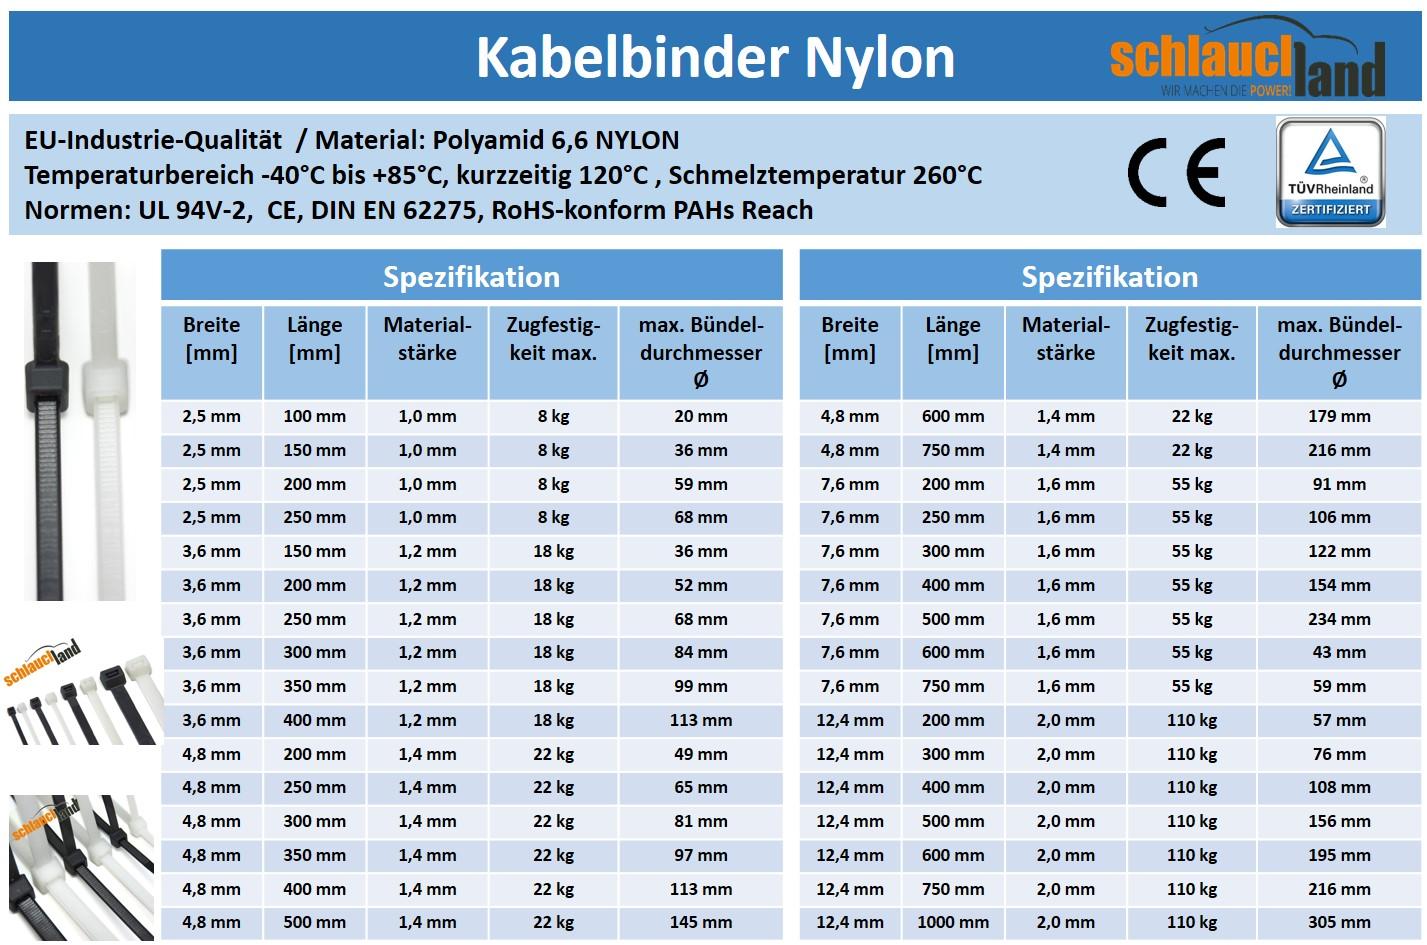 Datenblatt Kabelbinder Nylon